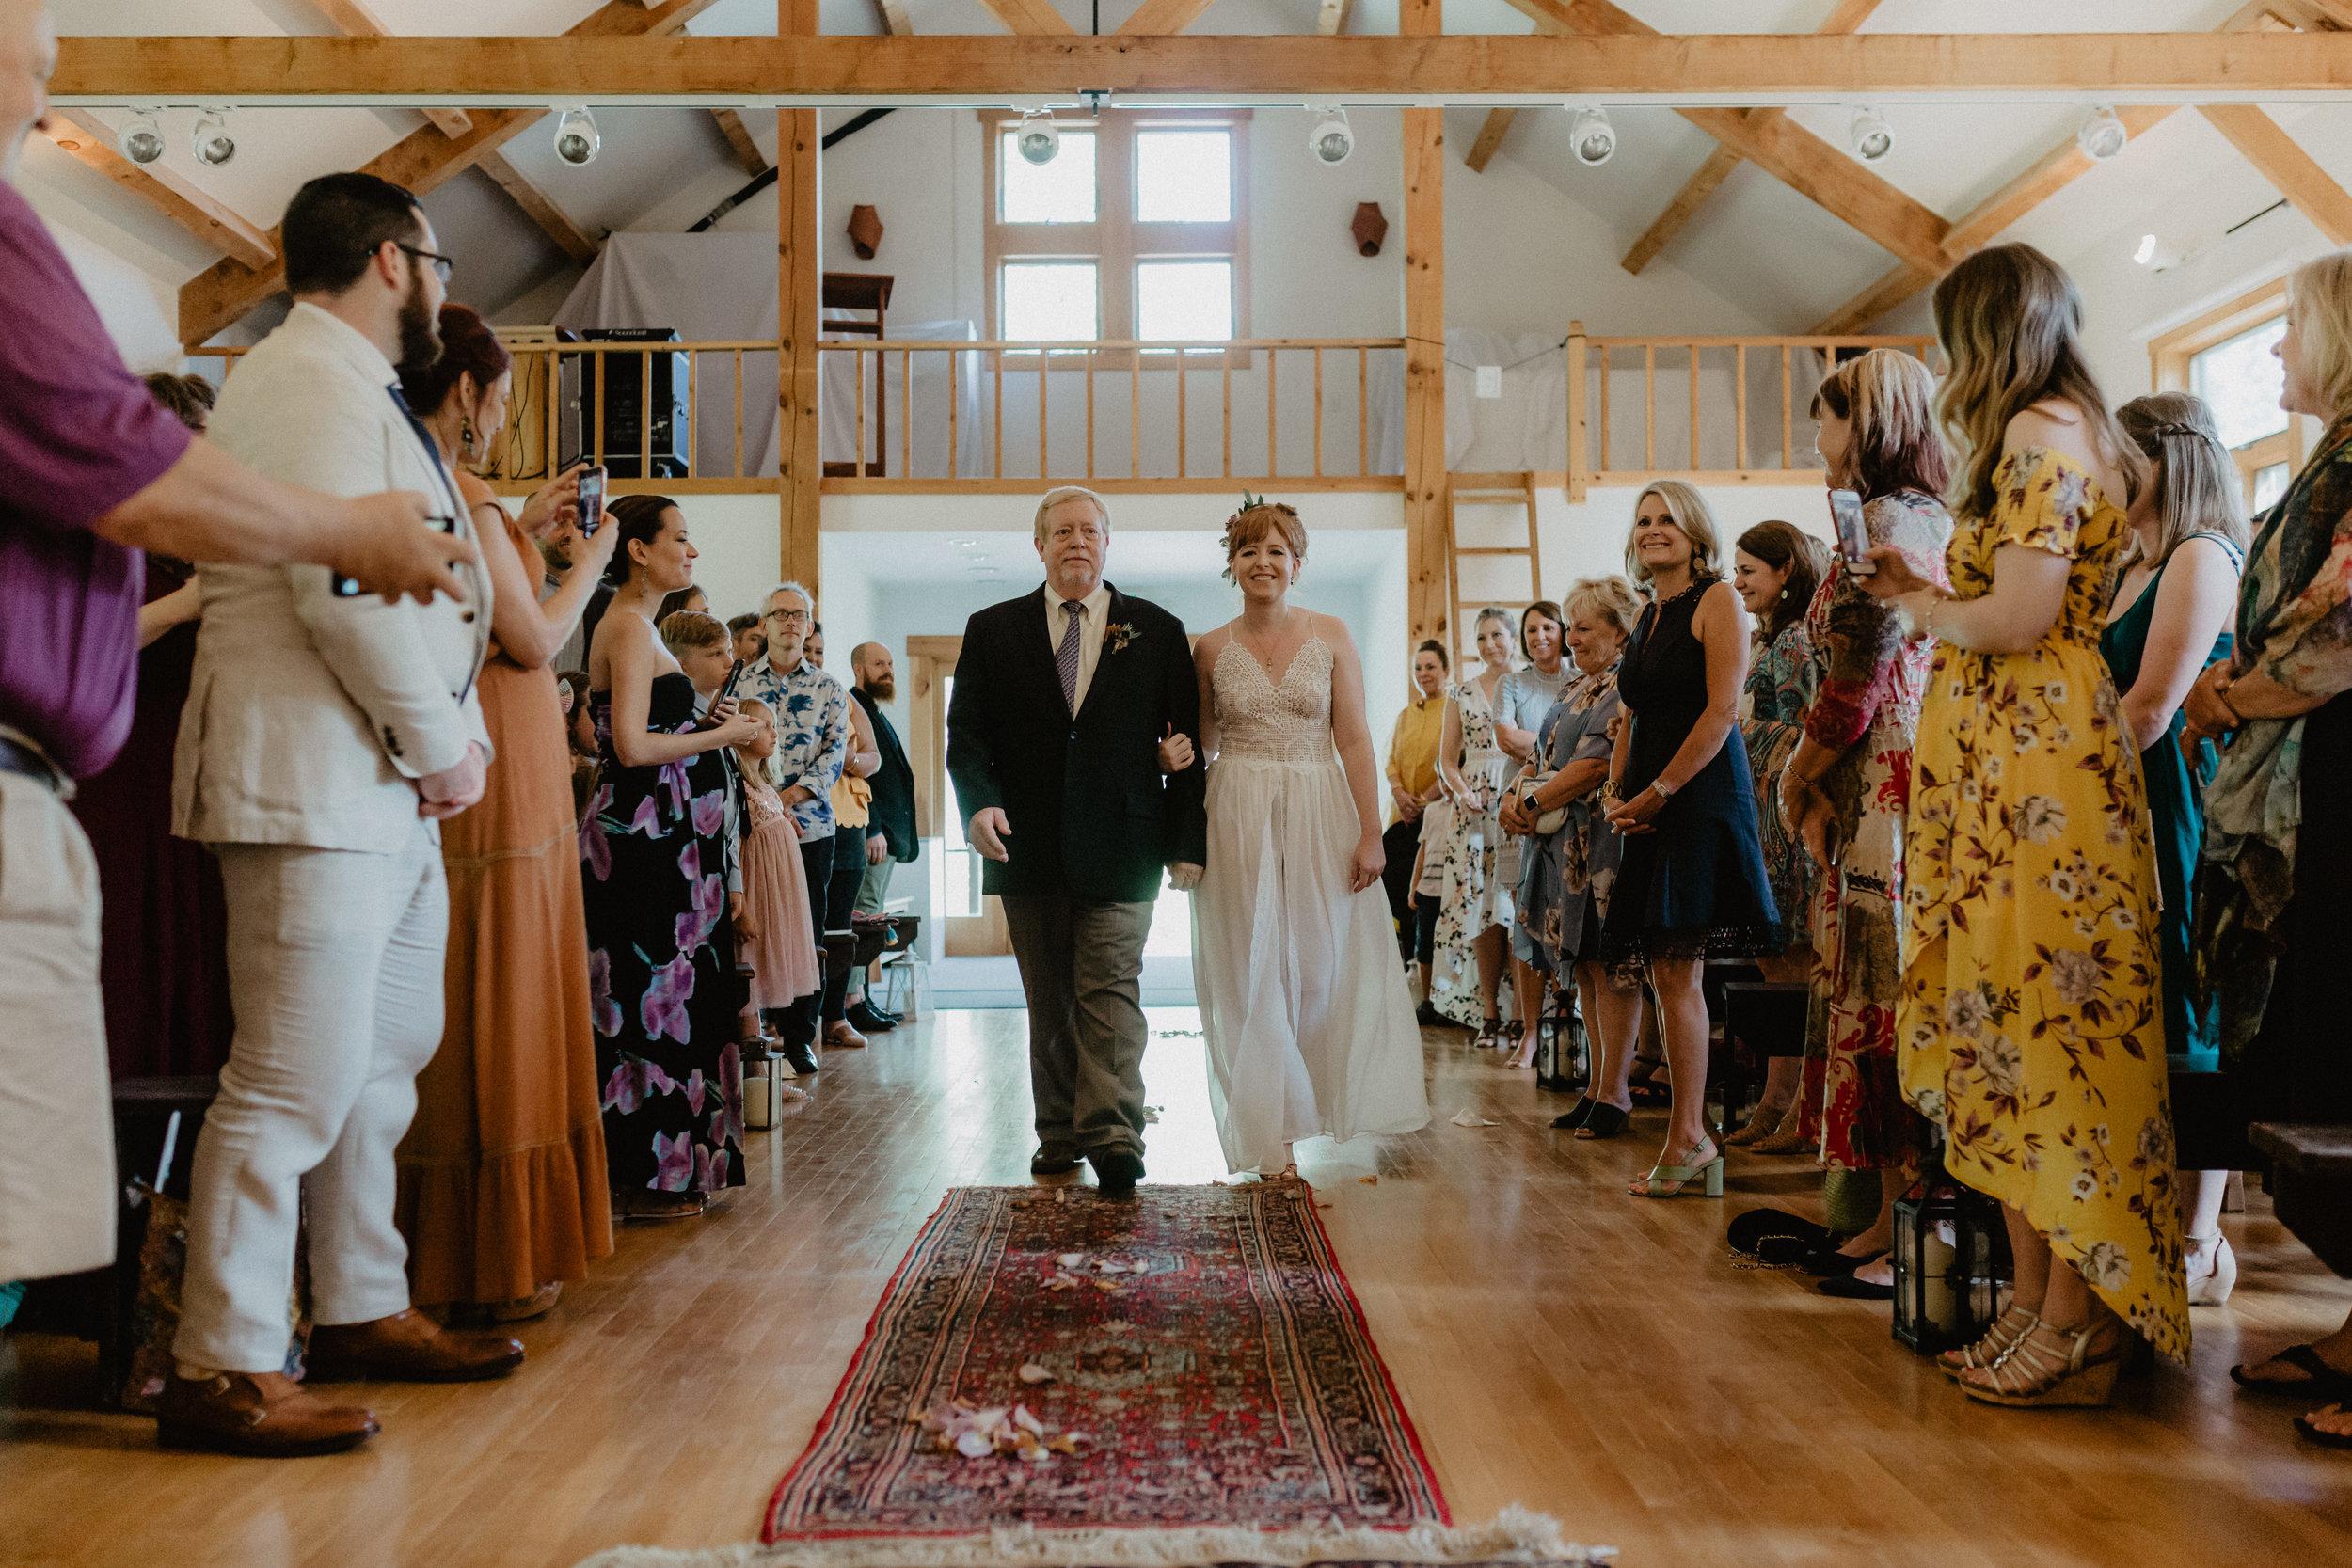 mount-tremper-arts-wedding044.jpg